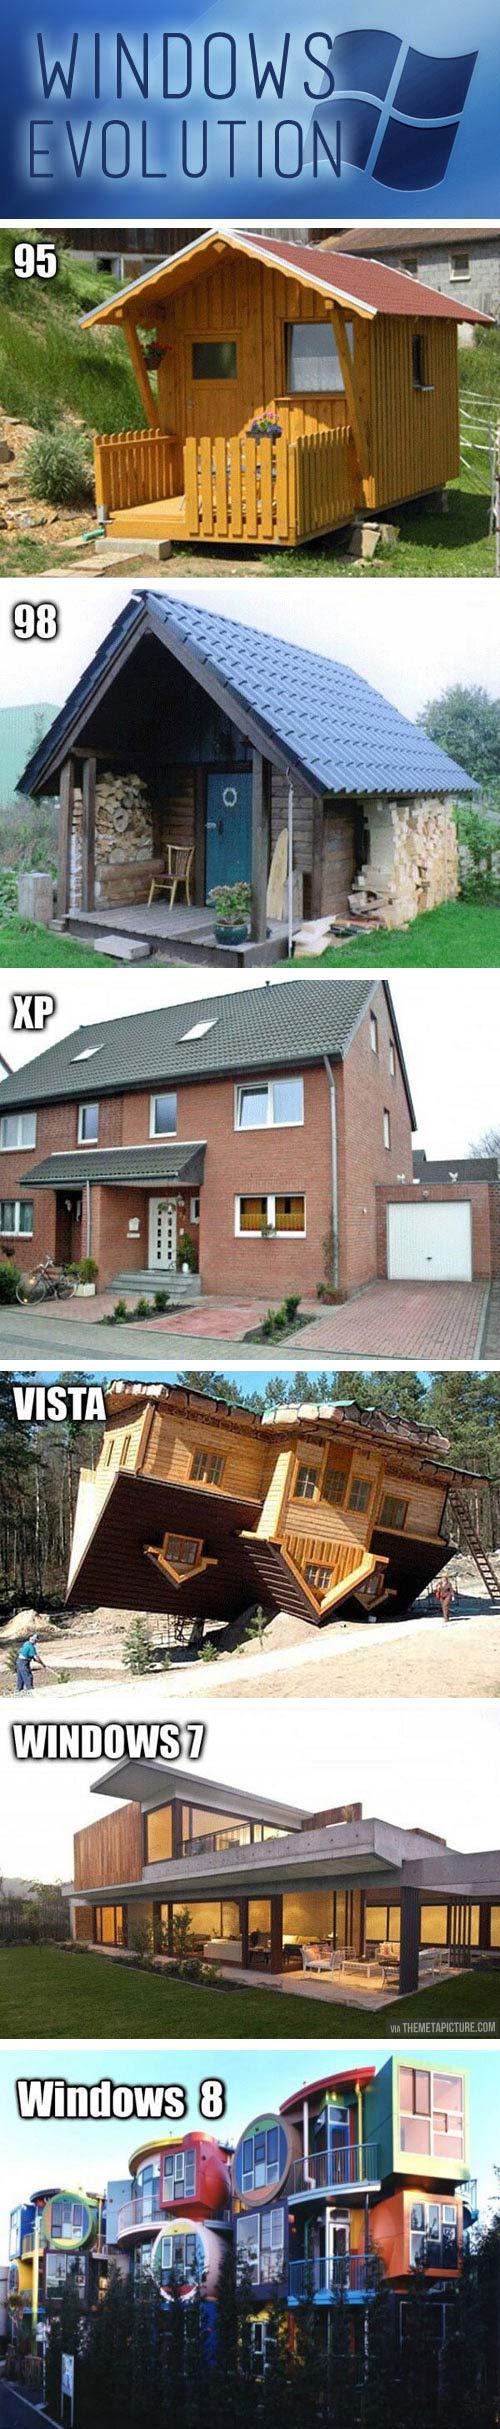 Windows evolution…